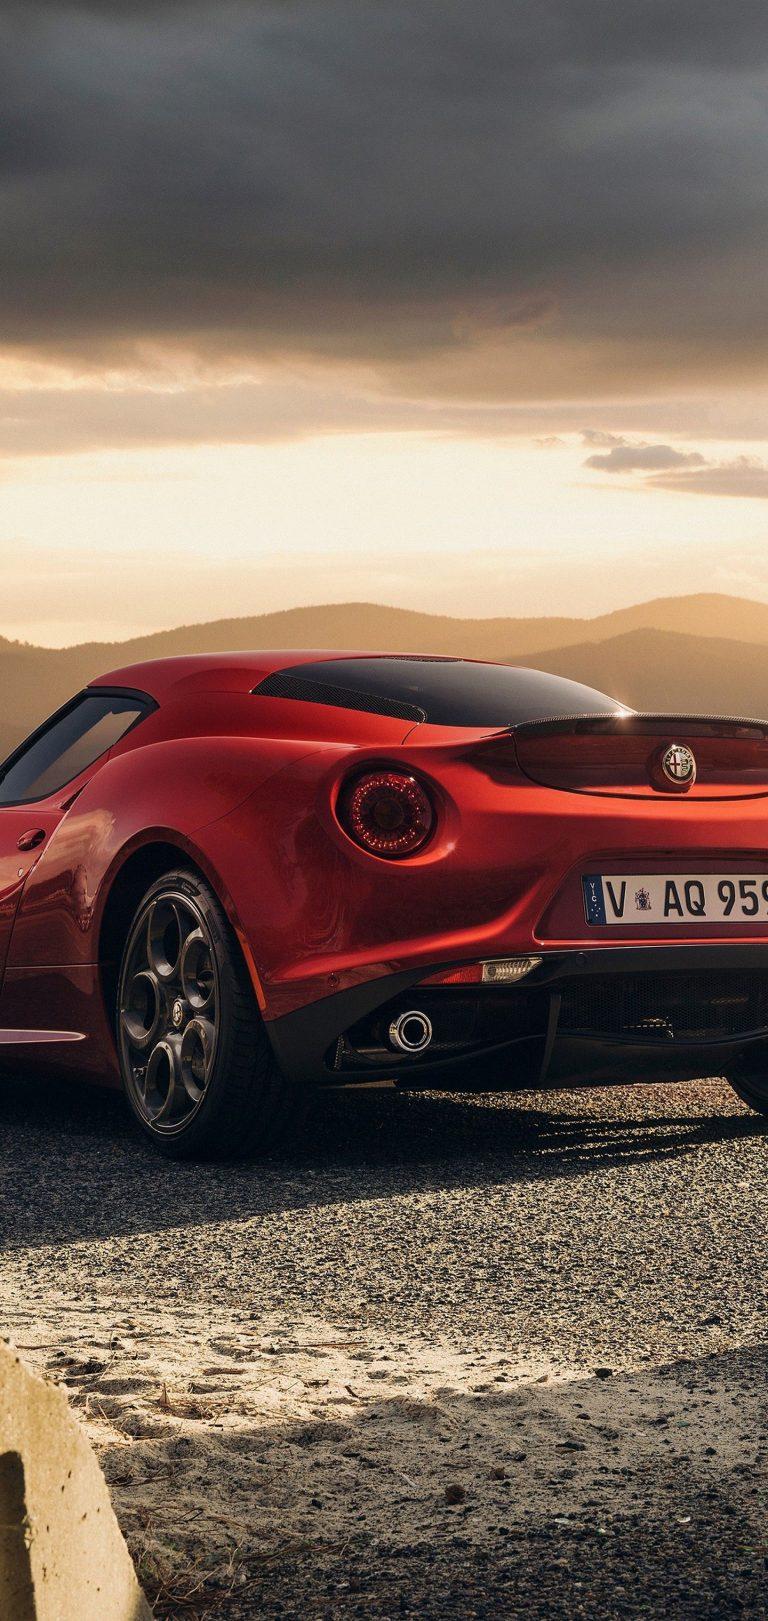 Alfa Romeo 4c Launch Edition Red Wallpaper 1440x3040 768x1621